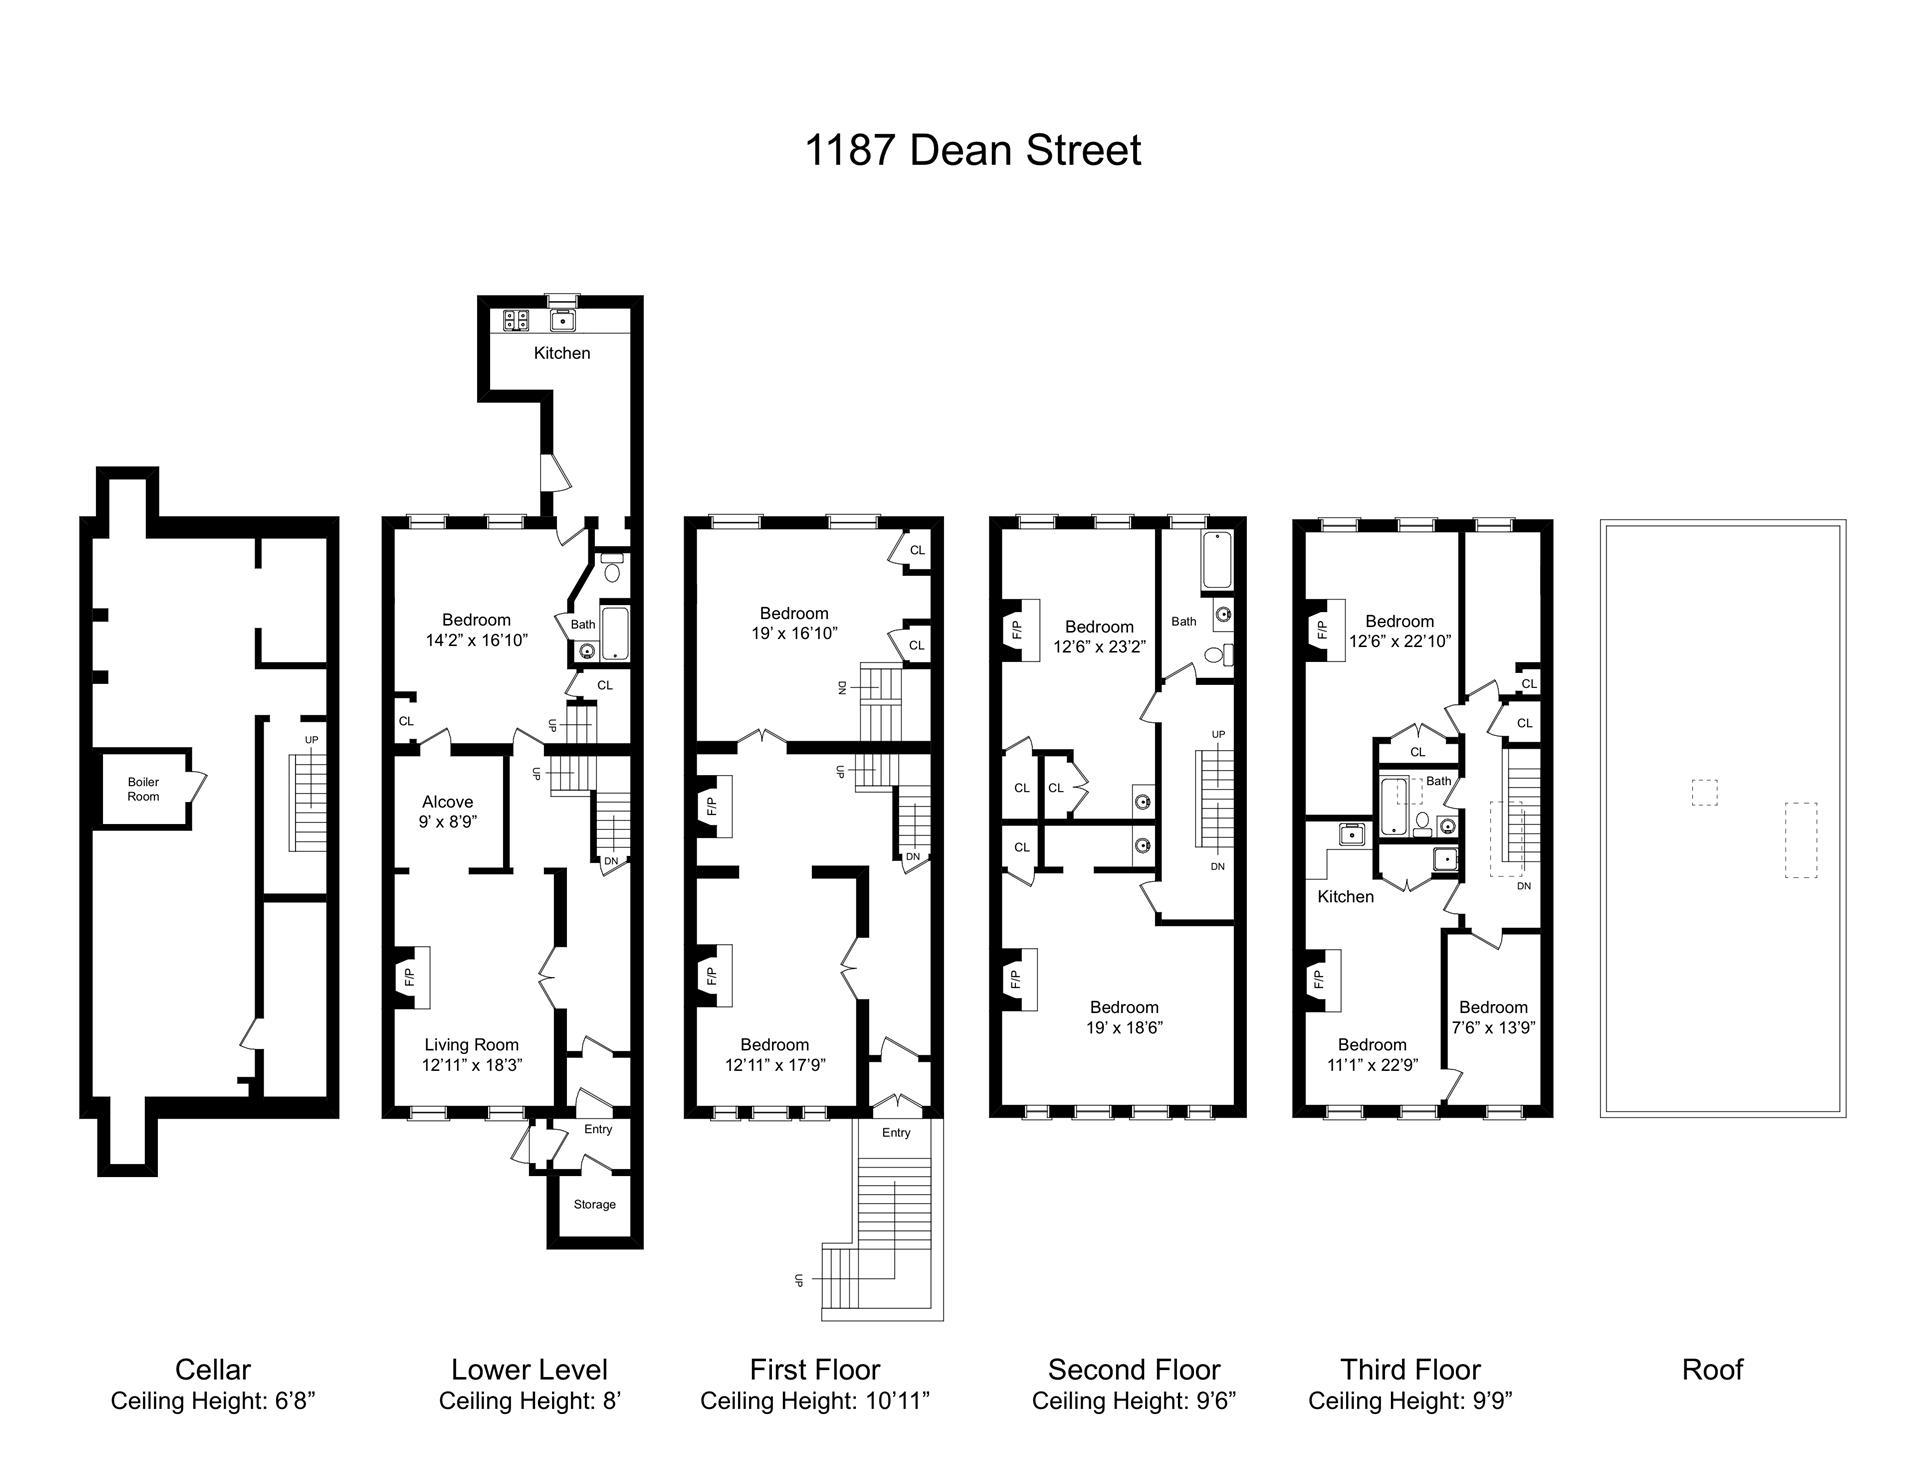 Floor plan of 1187 Dean St - Crown Heights, New York